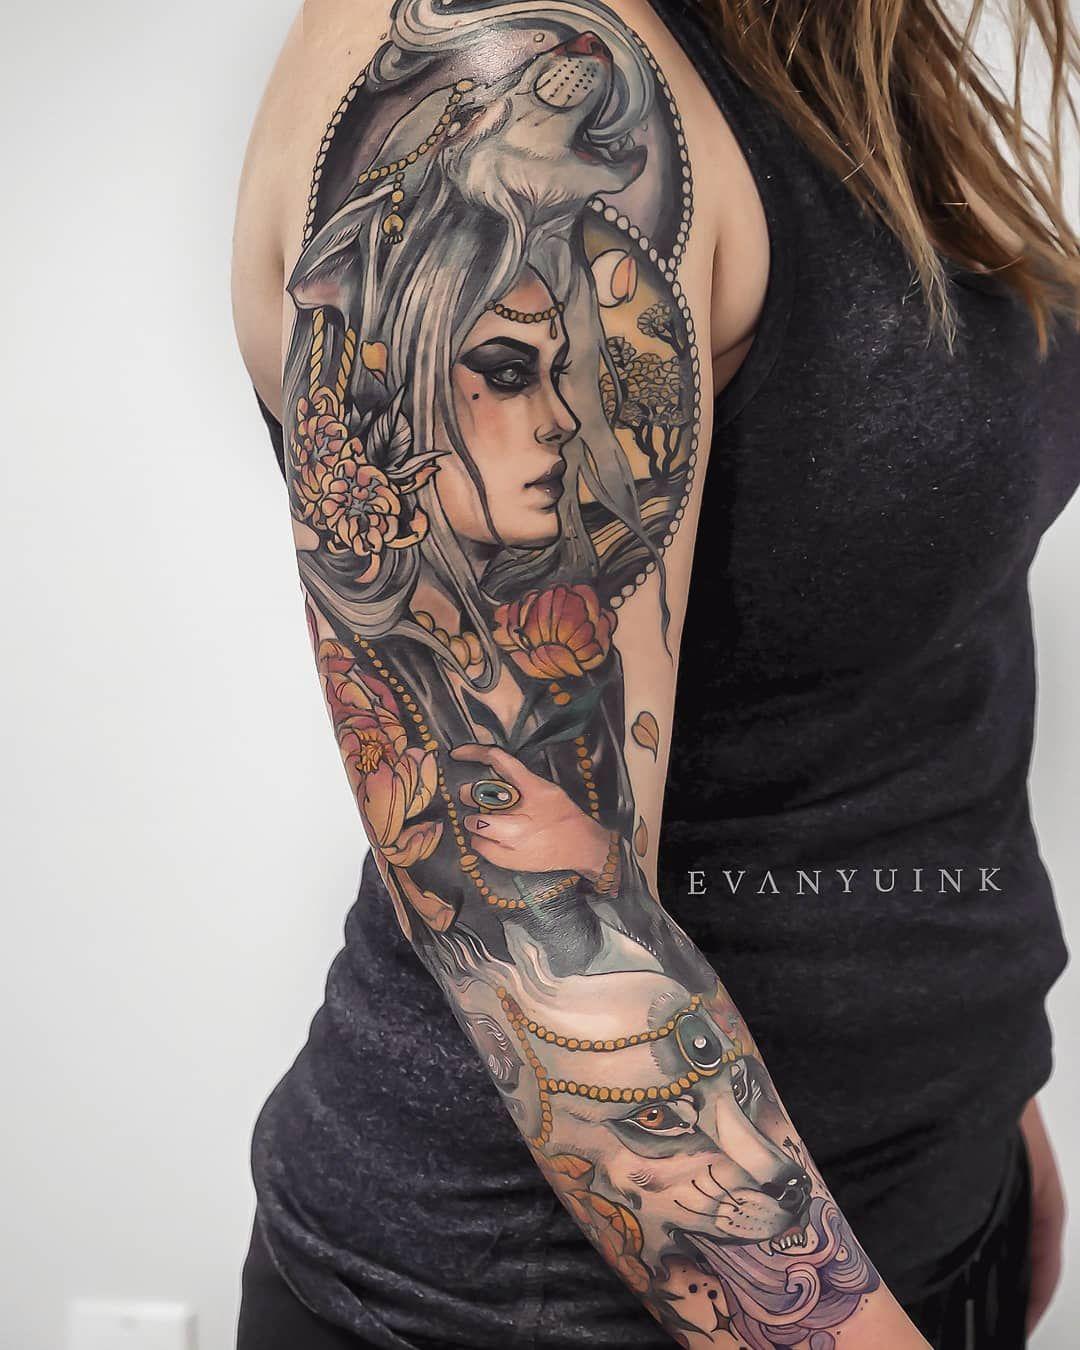 Neo Traditional Spirit Neo Traditional Tattoo Traditional Tattoo Sleeve Tattoos For Women Half Sleeve